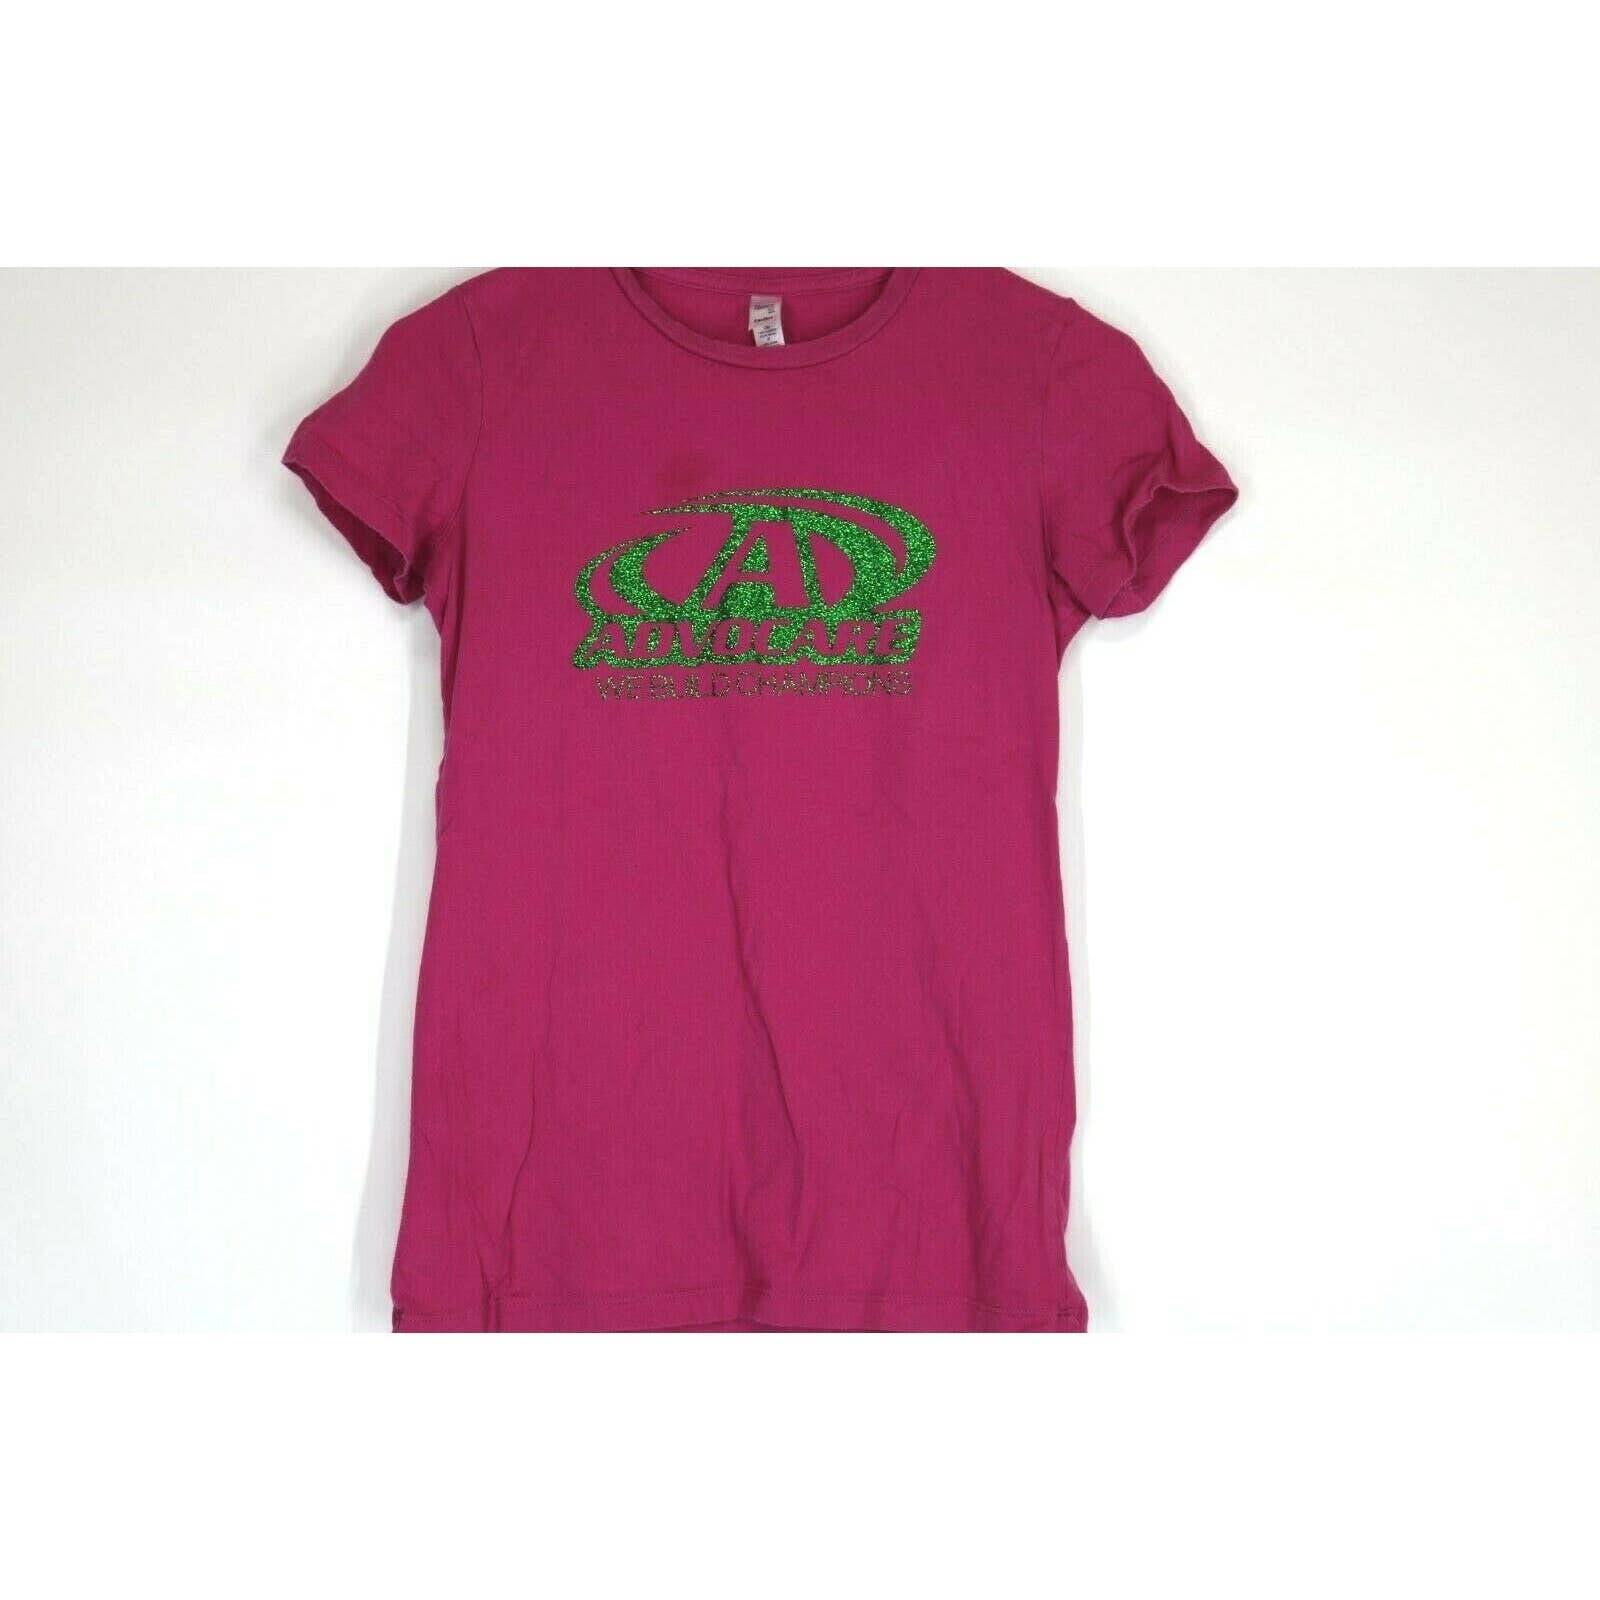 Bella The Favorite T-Shirt Women's Sz S